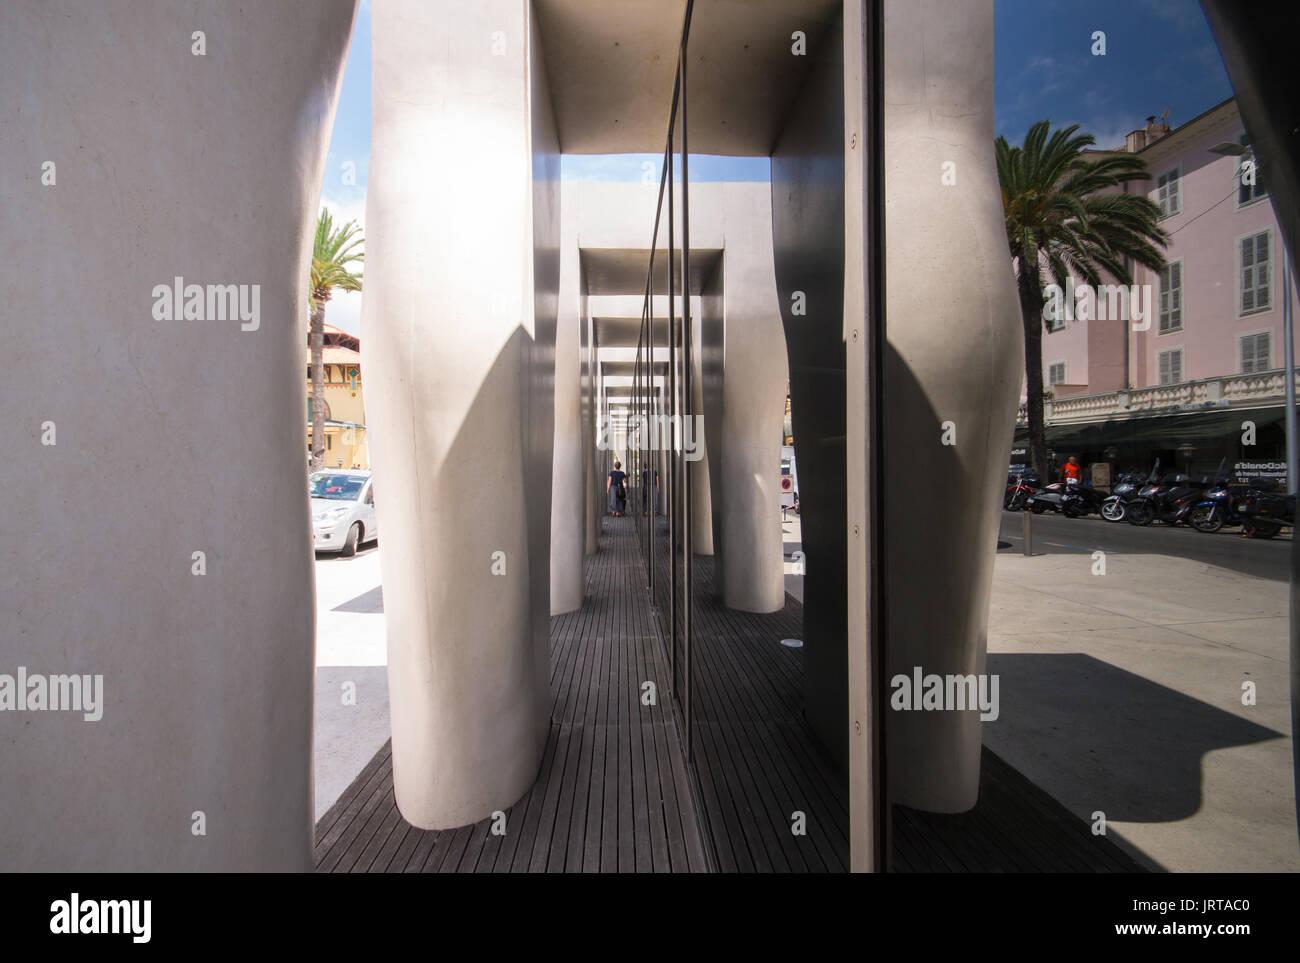 Jean Cocteau Museum, Menton, French Riviera: architect Rudy Ricciotti exterior colonnade mirror1 Inexhibit - Stock Image